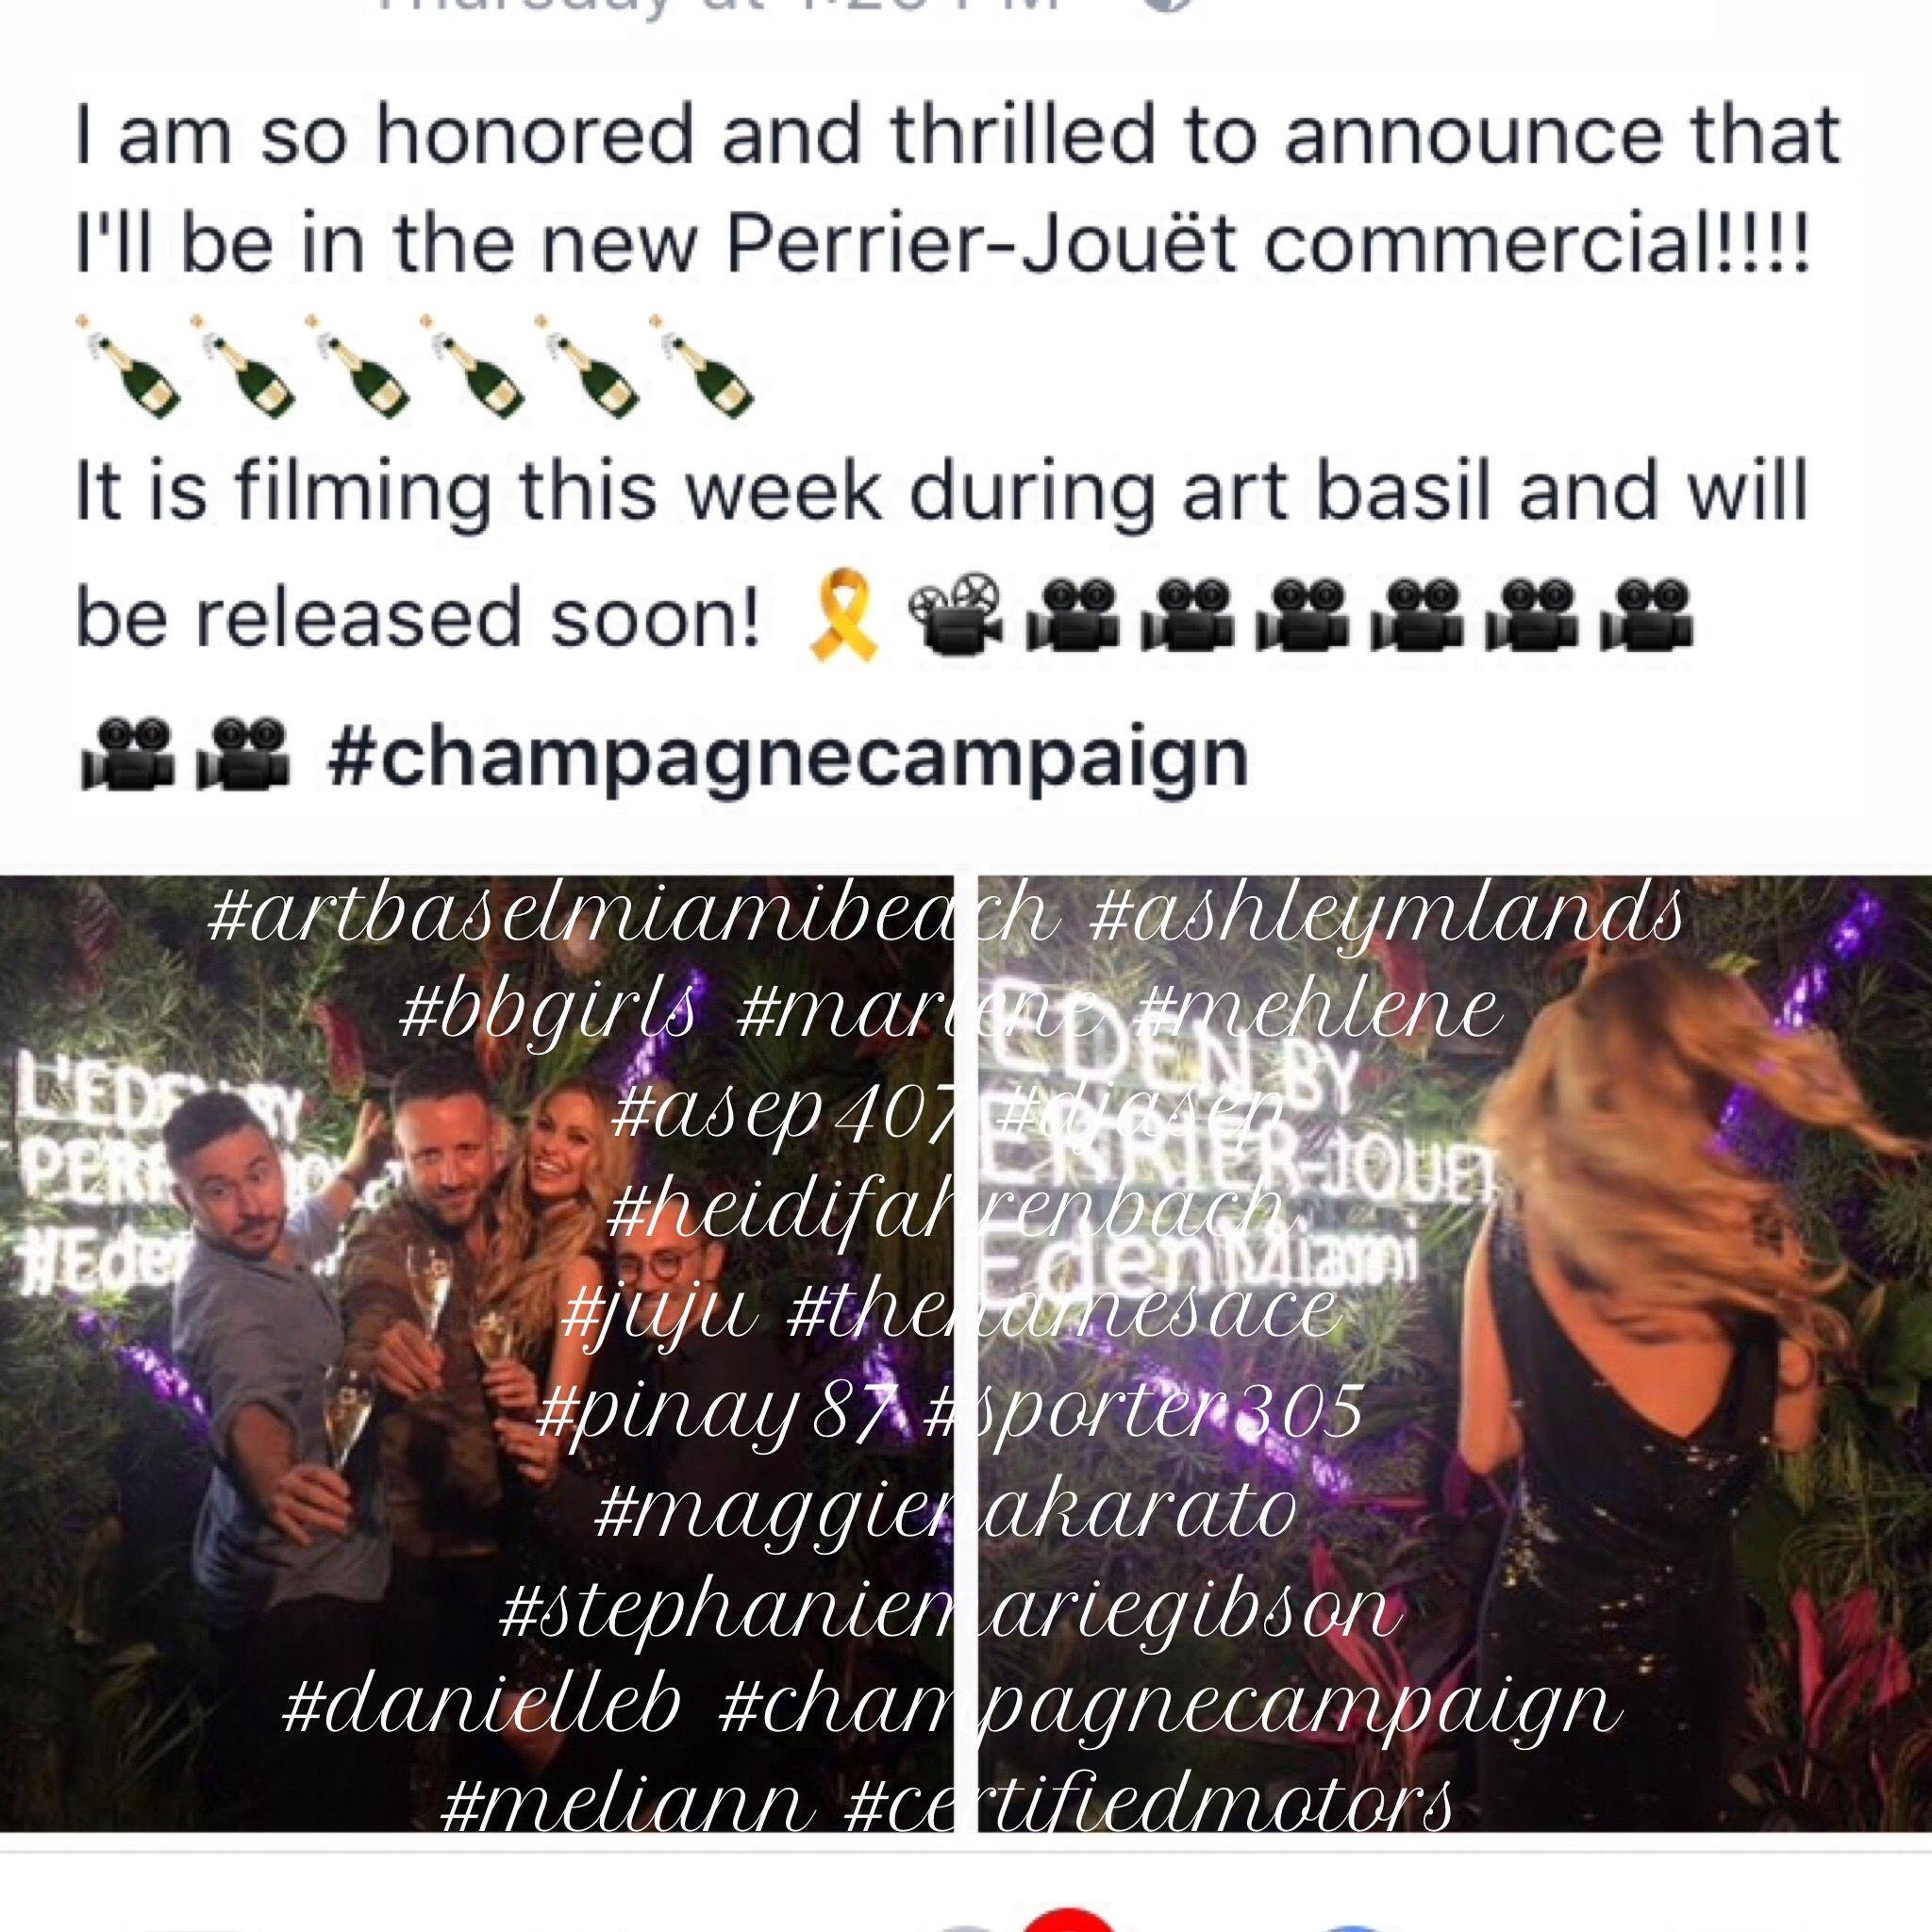 #artbaselmiamibeach #ashleymlands #bbgirls #marlene #mehlene #asep407 #djasep #heidifahrenbach #juju #thenamesace #pinay87 #sporter305 #maggienakarato #stephaniemariegibson #danielleb #champagnecampaign #meliann #certifiedmotors